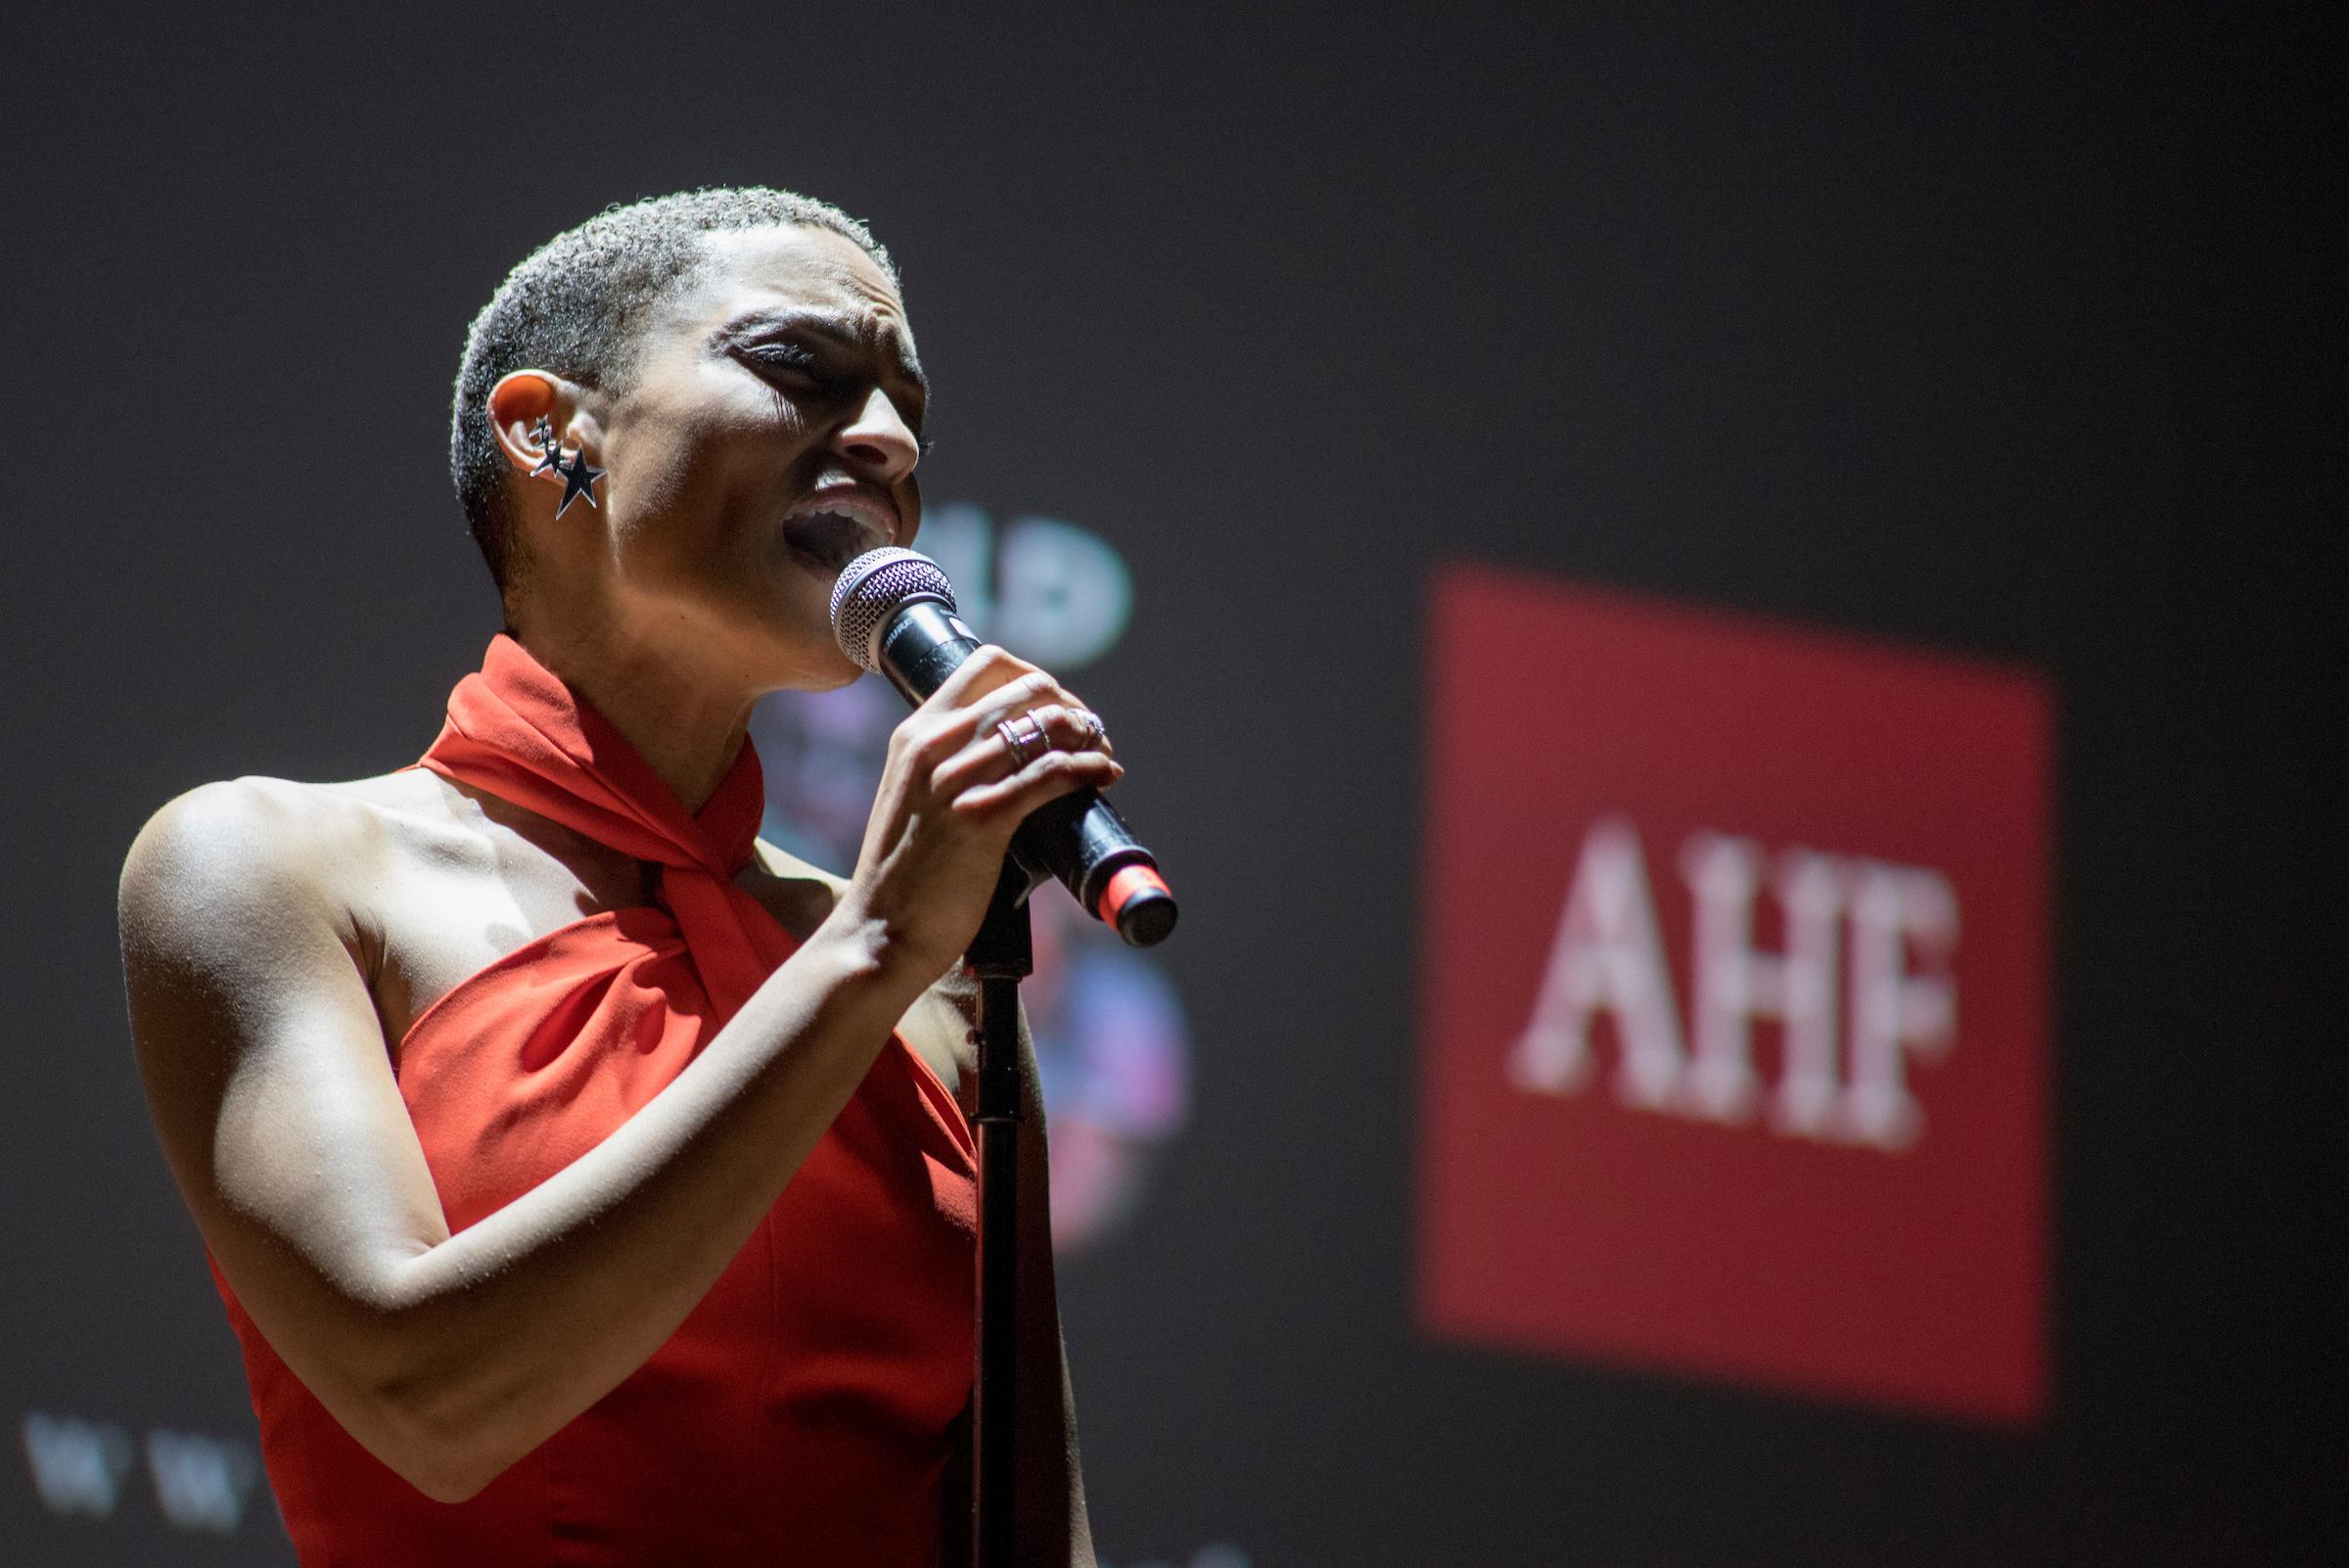 R&B Singer and AHF Ambassador Goapele Mohlabane (Photo: Business Wire)